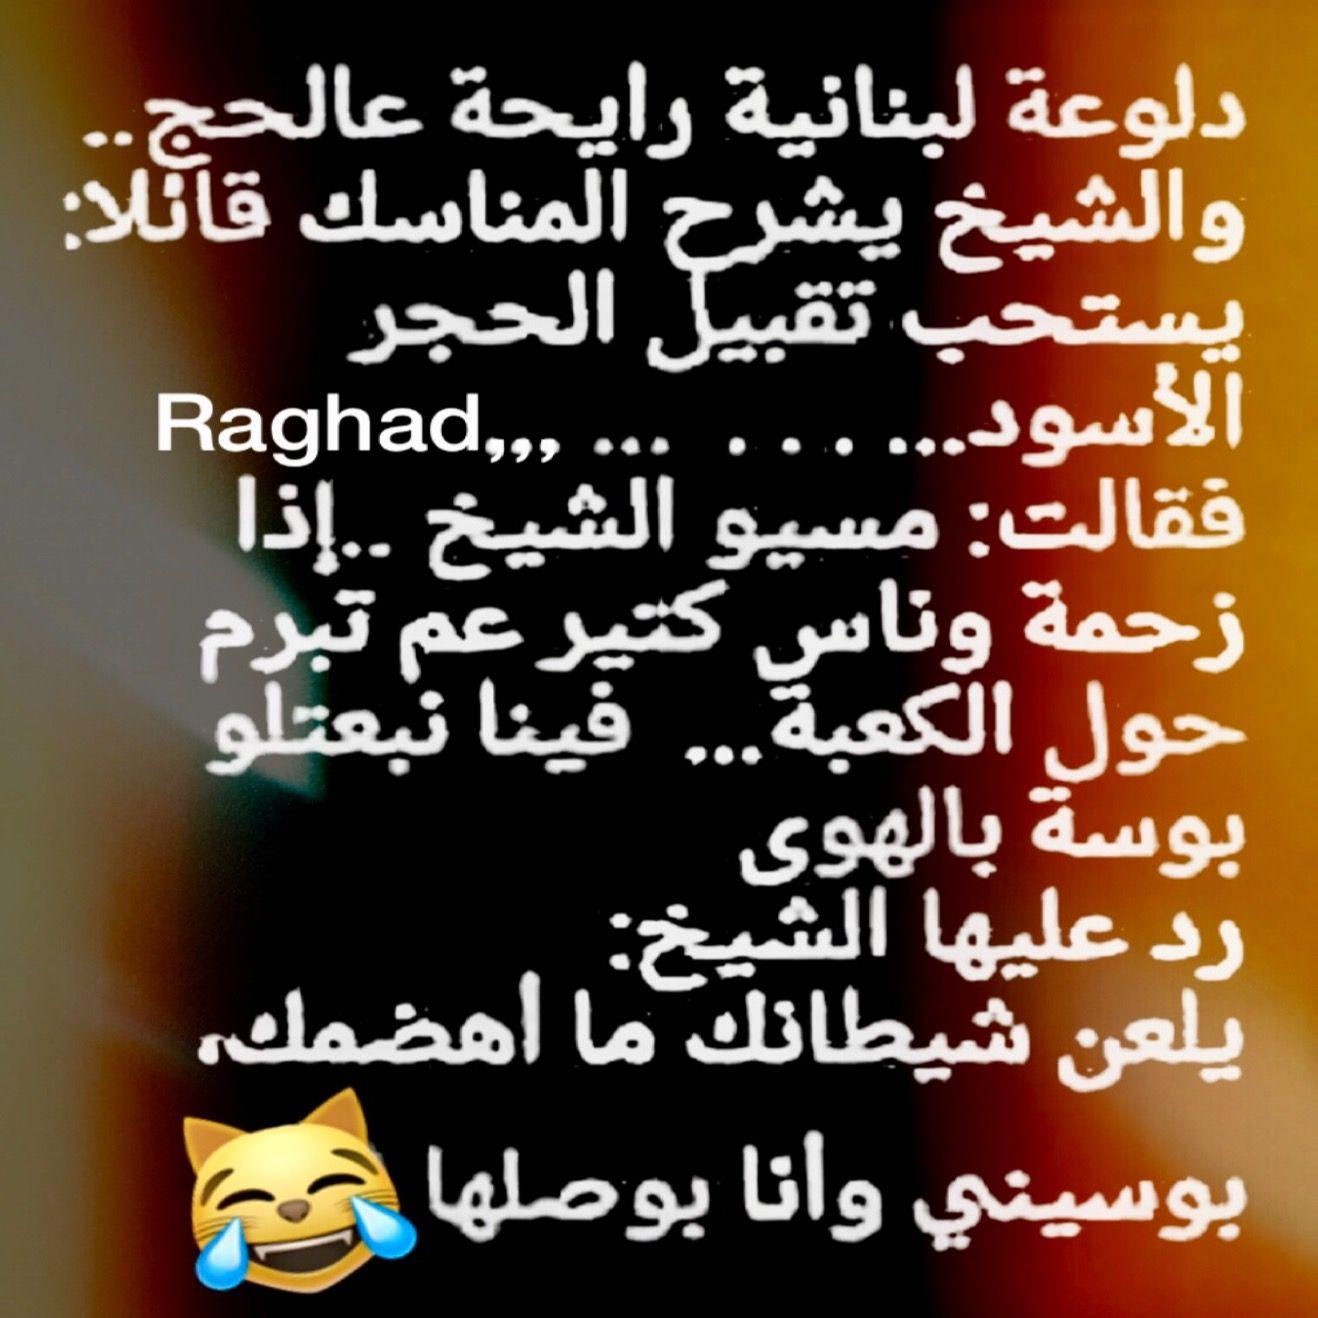 Desertrose ههههه Arabic Calligraphy Arabic Calligraphy